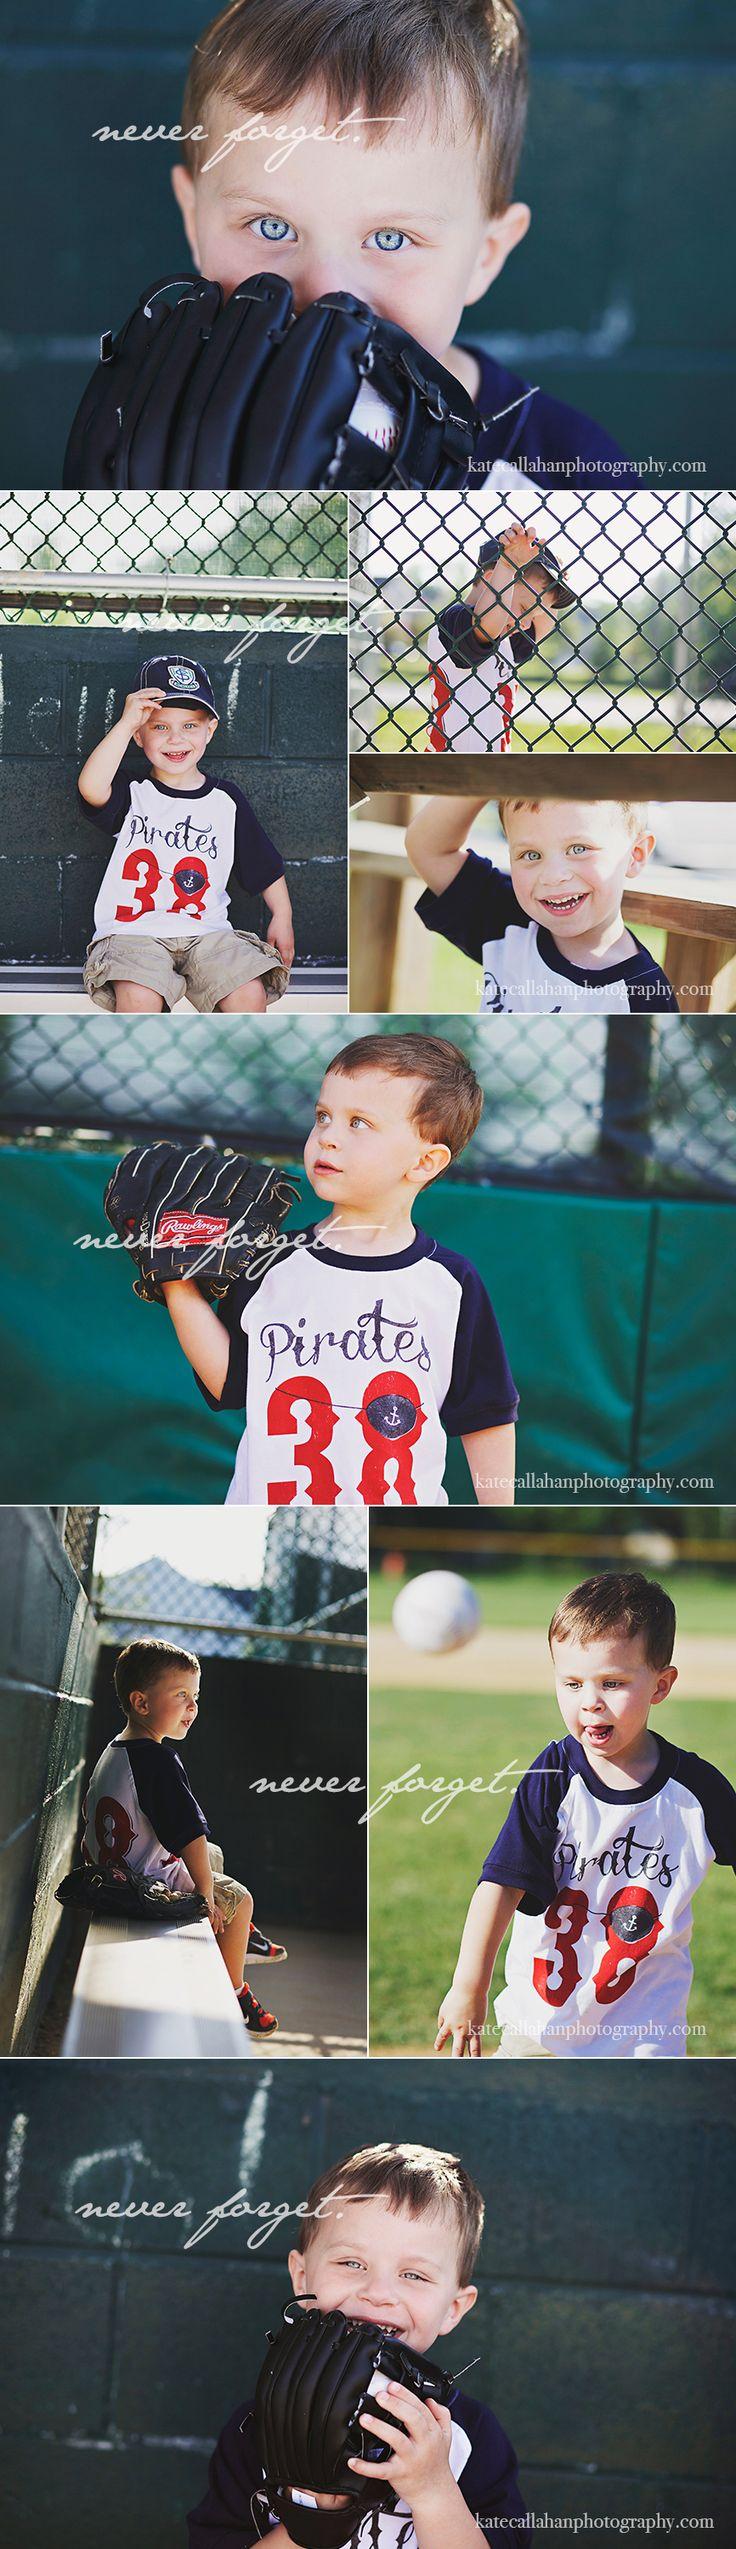 Surprise Baseball Pictures for Dad — Newark, DE child photographer | Kate Callahan Photography